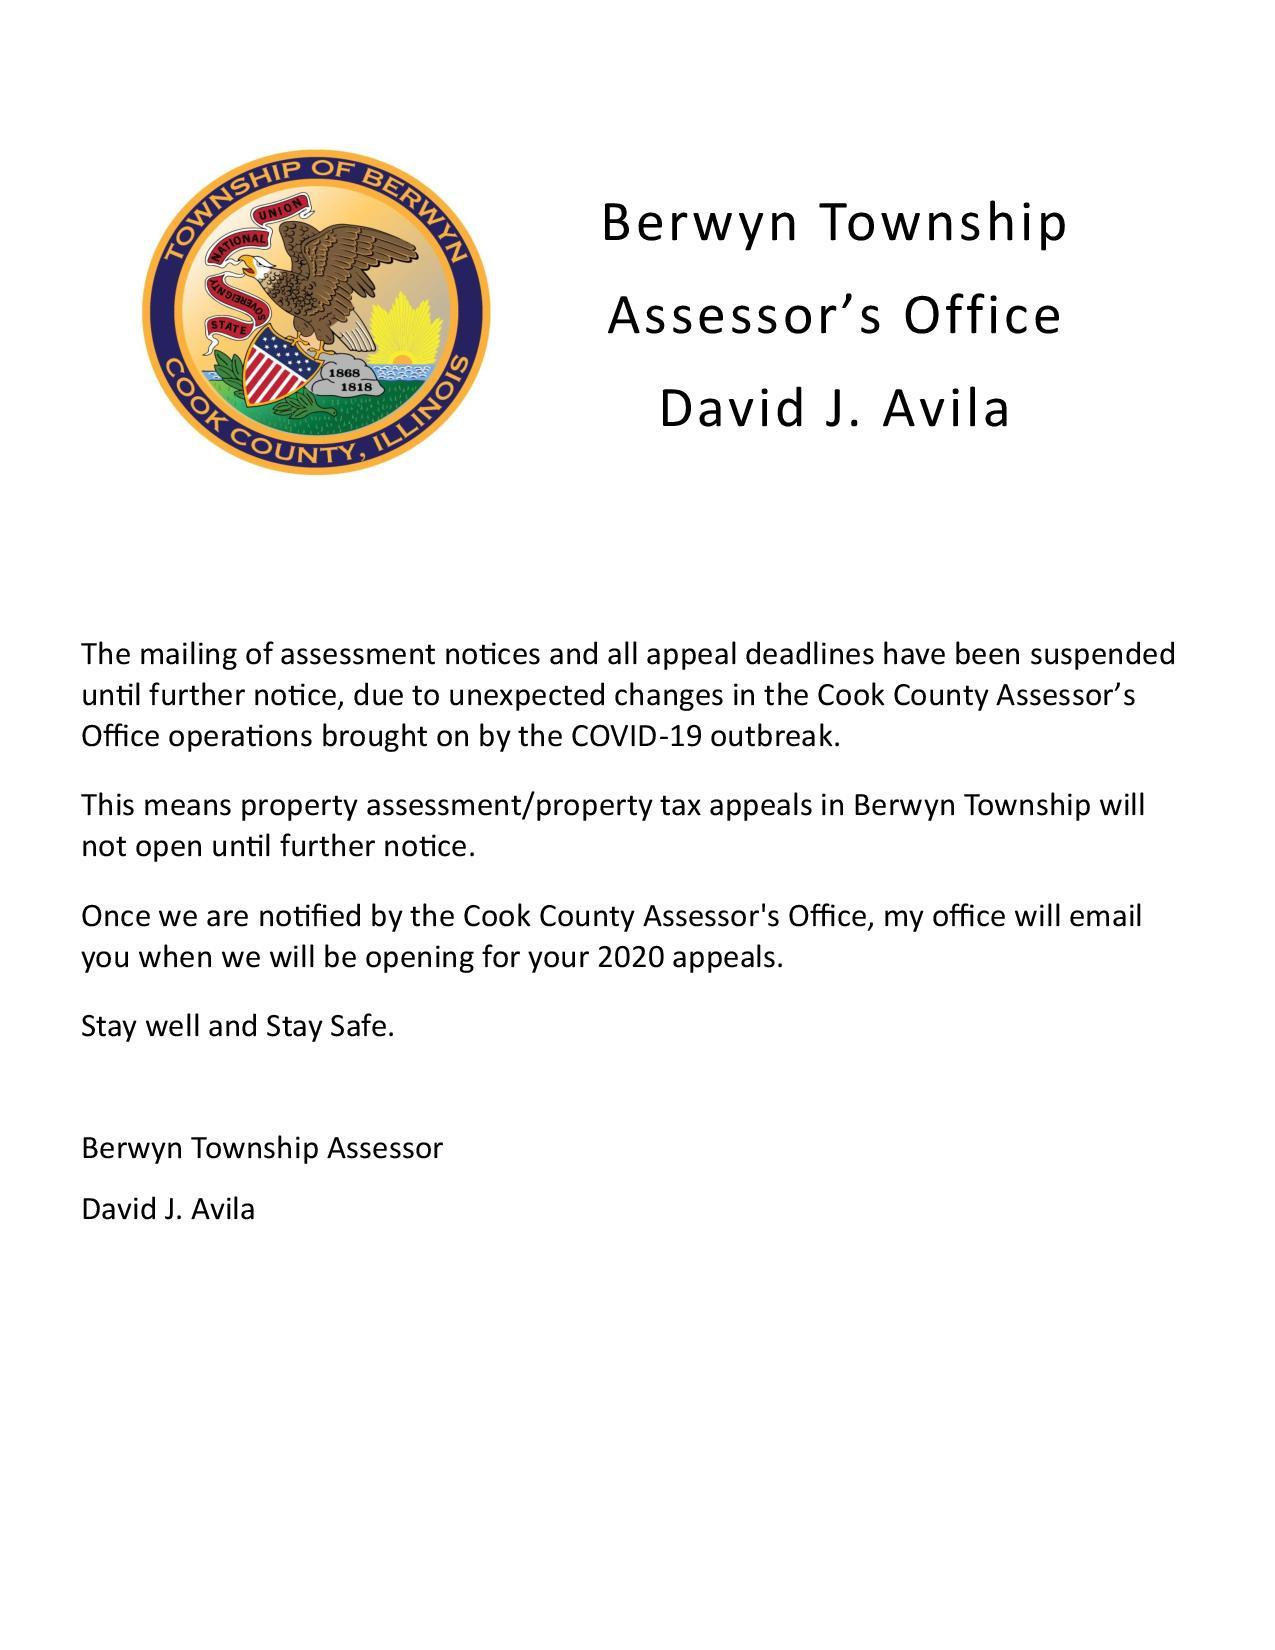 2020_Appeal_postpone_letter-page-001.jpg